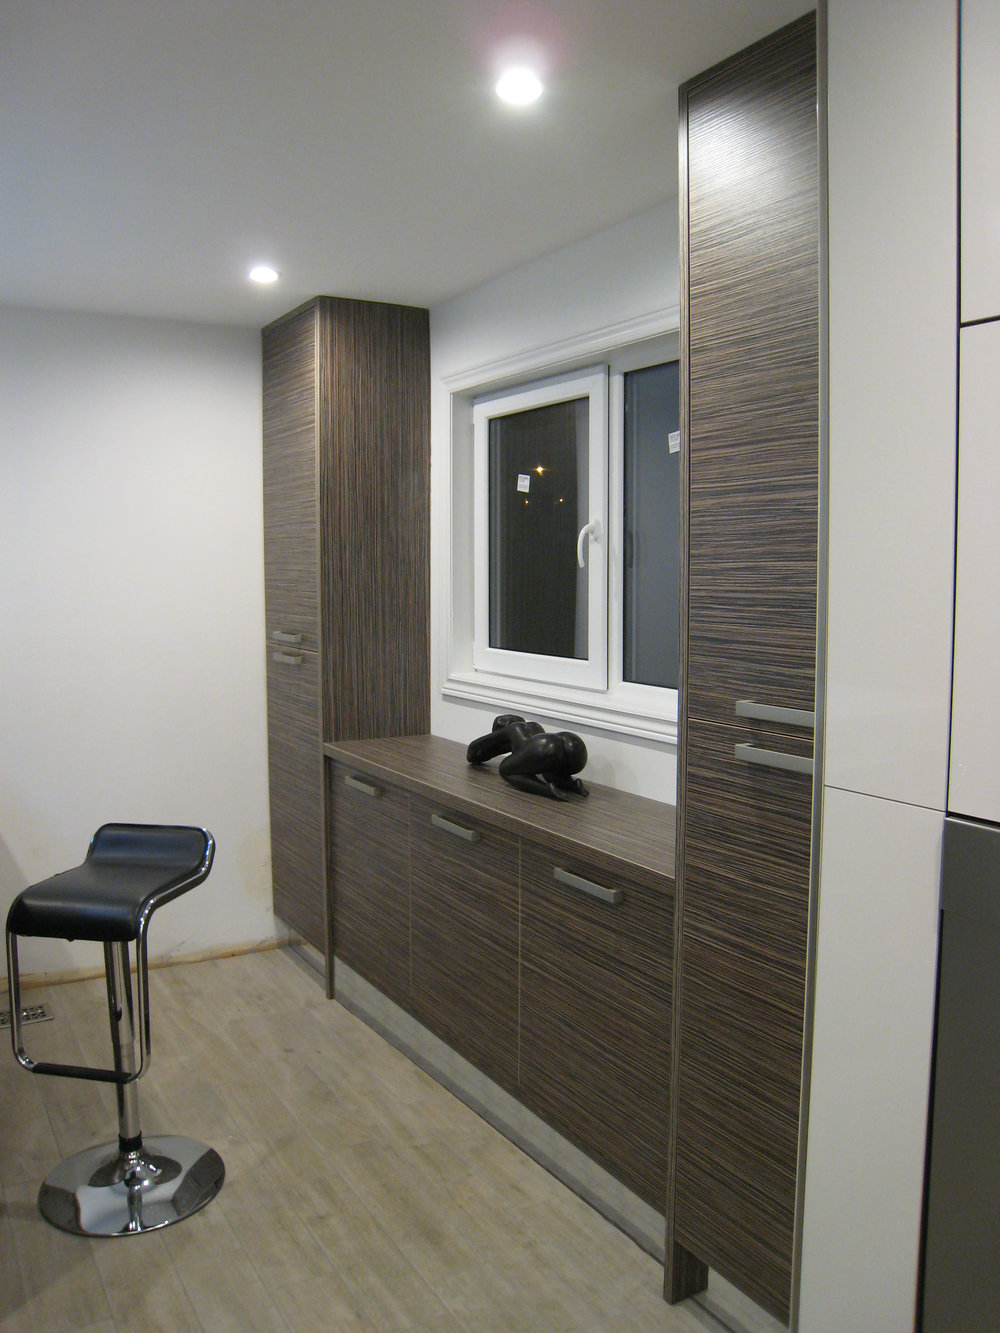 Kitchen 2 Pic 4.JPG